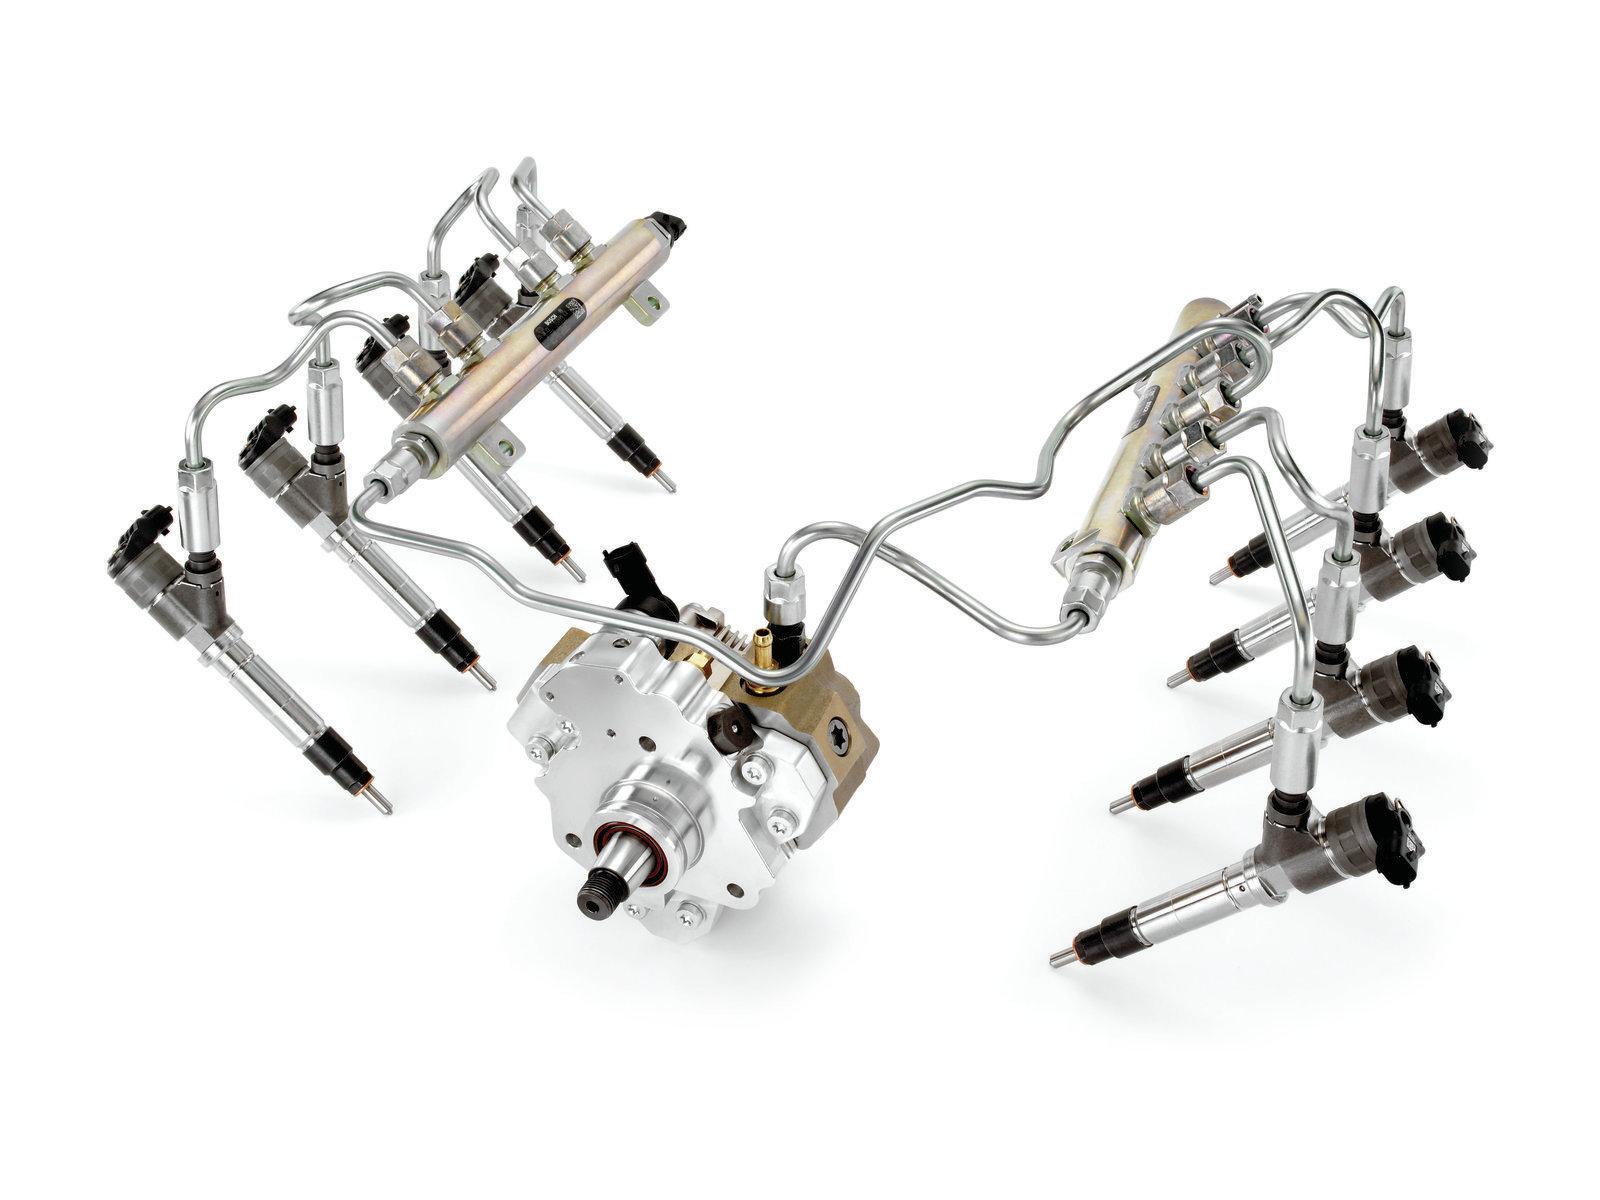 small resolution of diagram 2000 pontiac montana engine vibration dampener wiring library rh 99 budoshop4you de